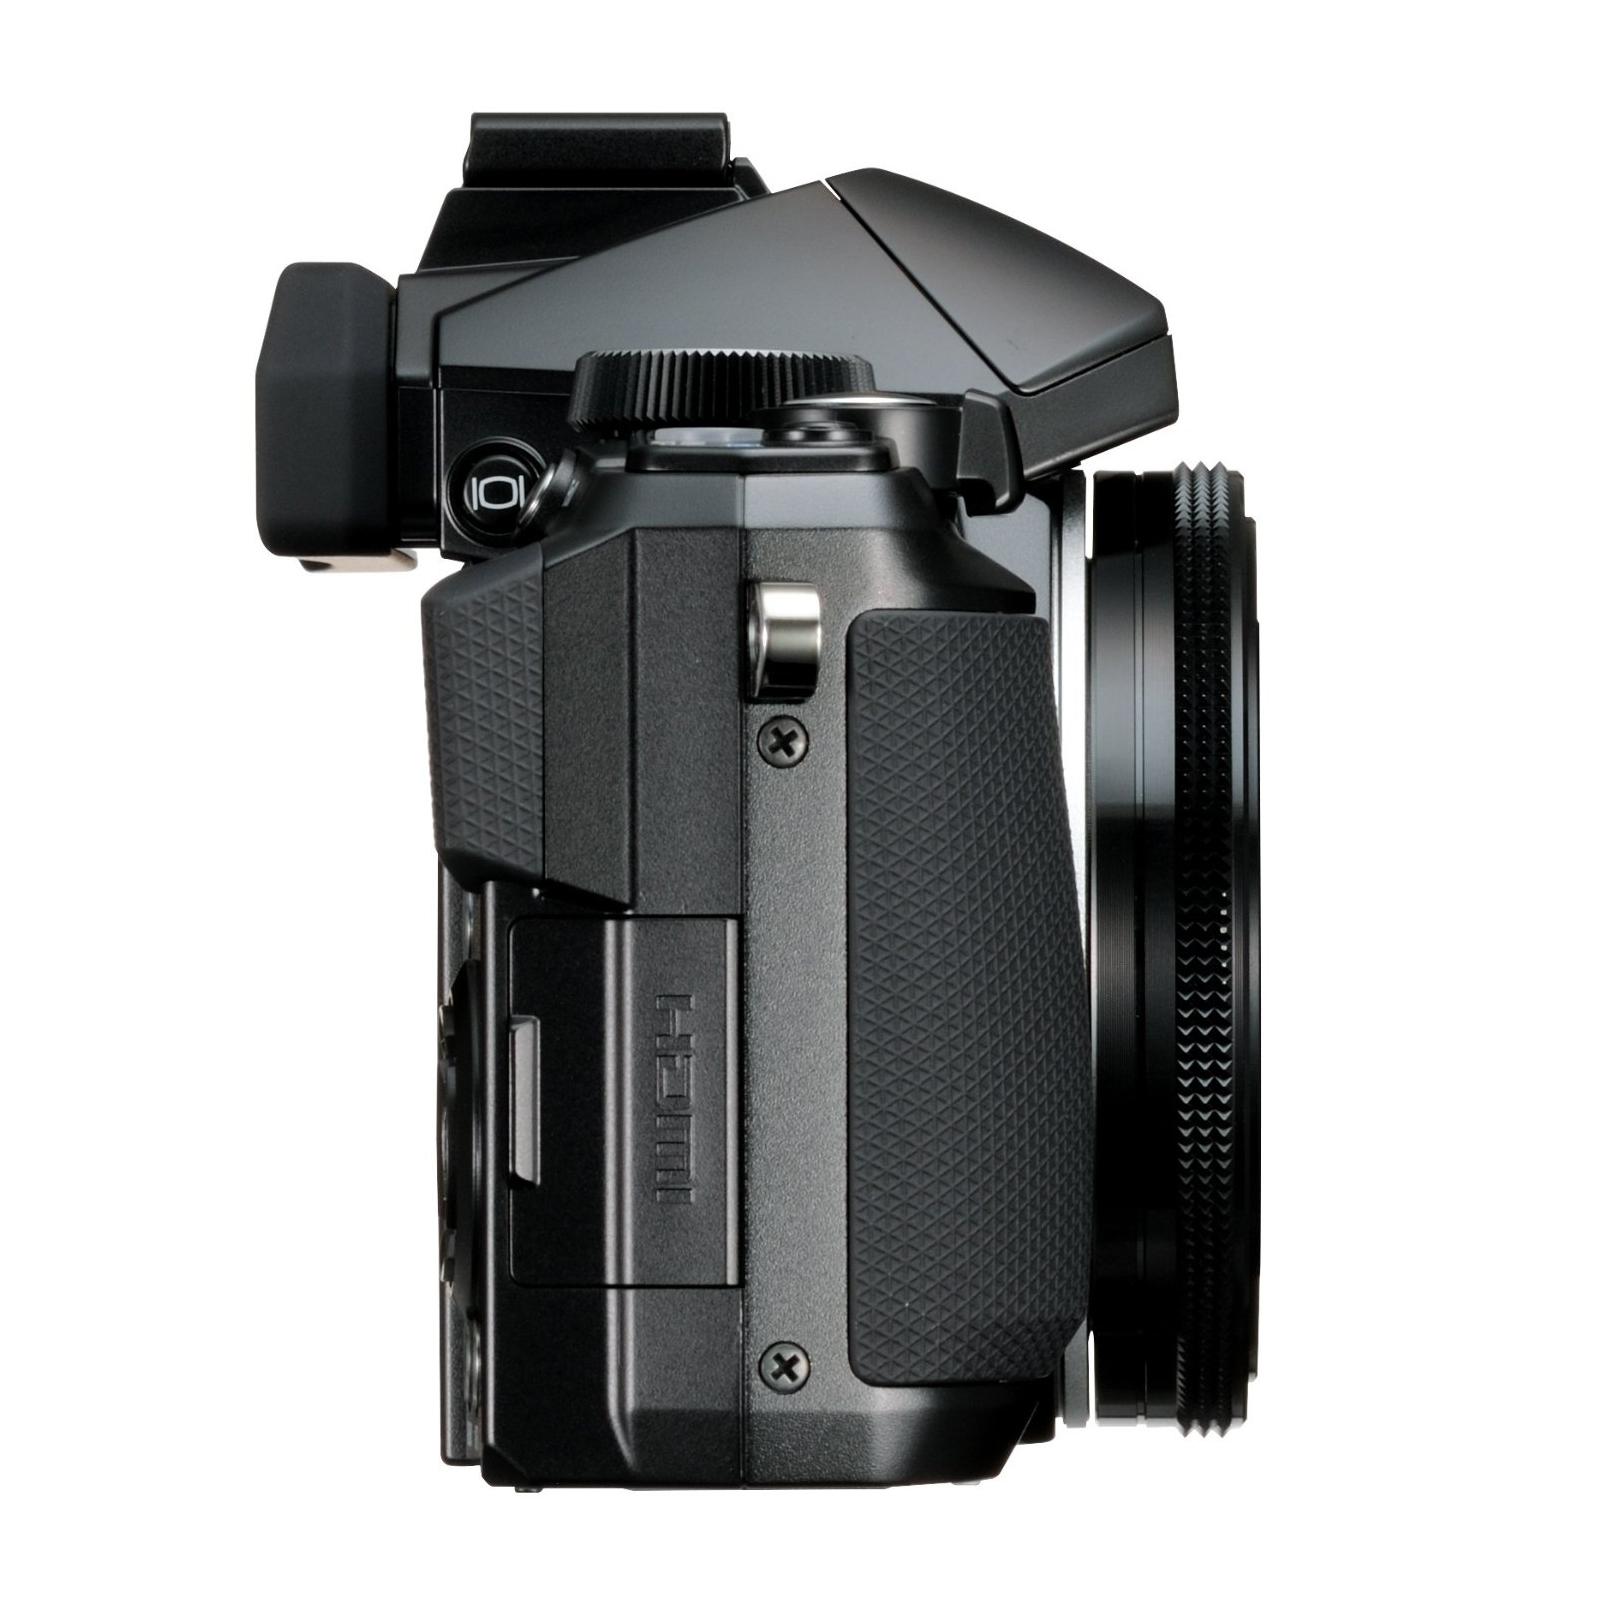 Цифровой фотоаппарат OLYMPUS STYLUS 1 Black (V109010BE000) изображение 11